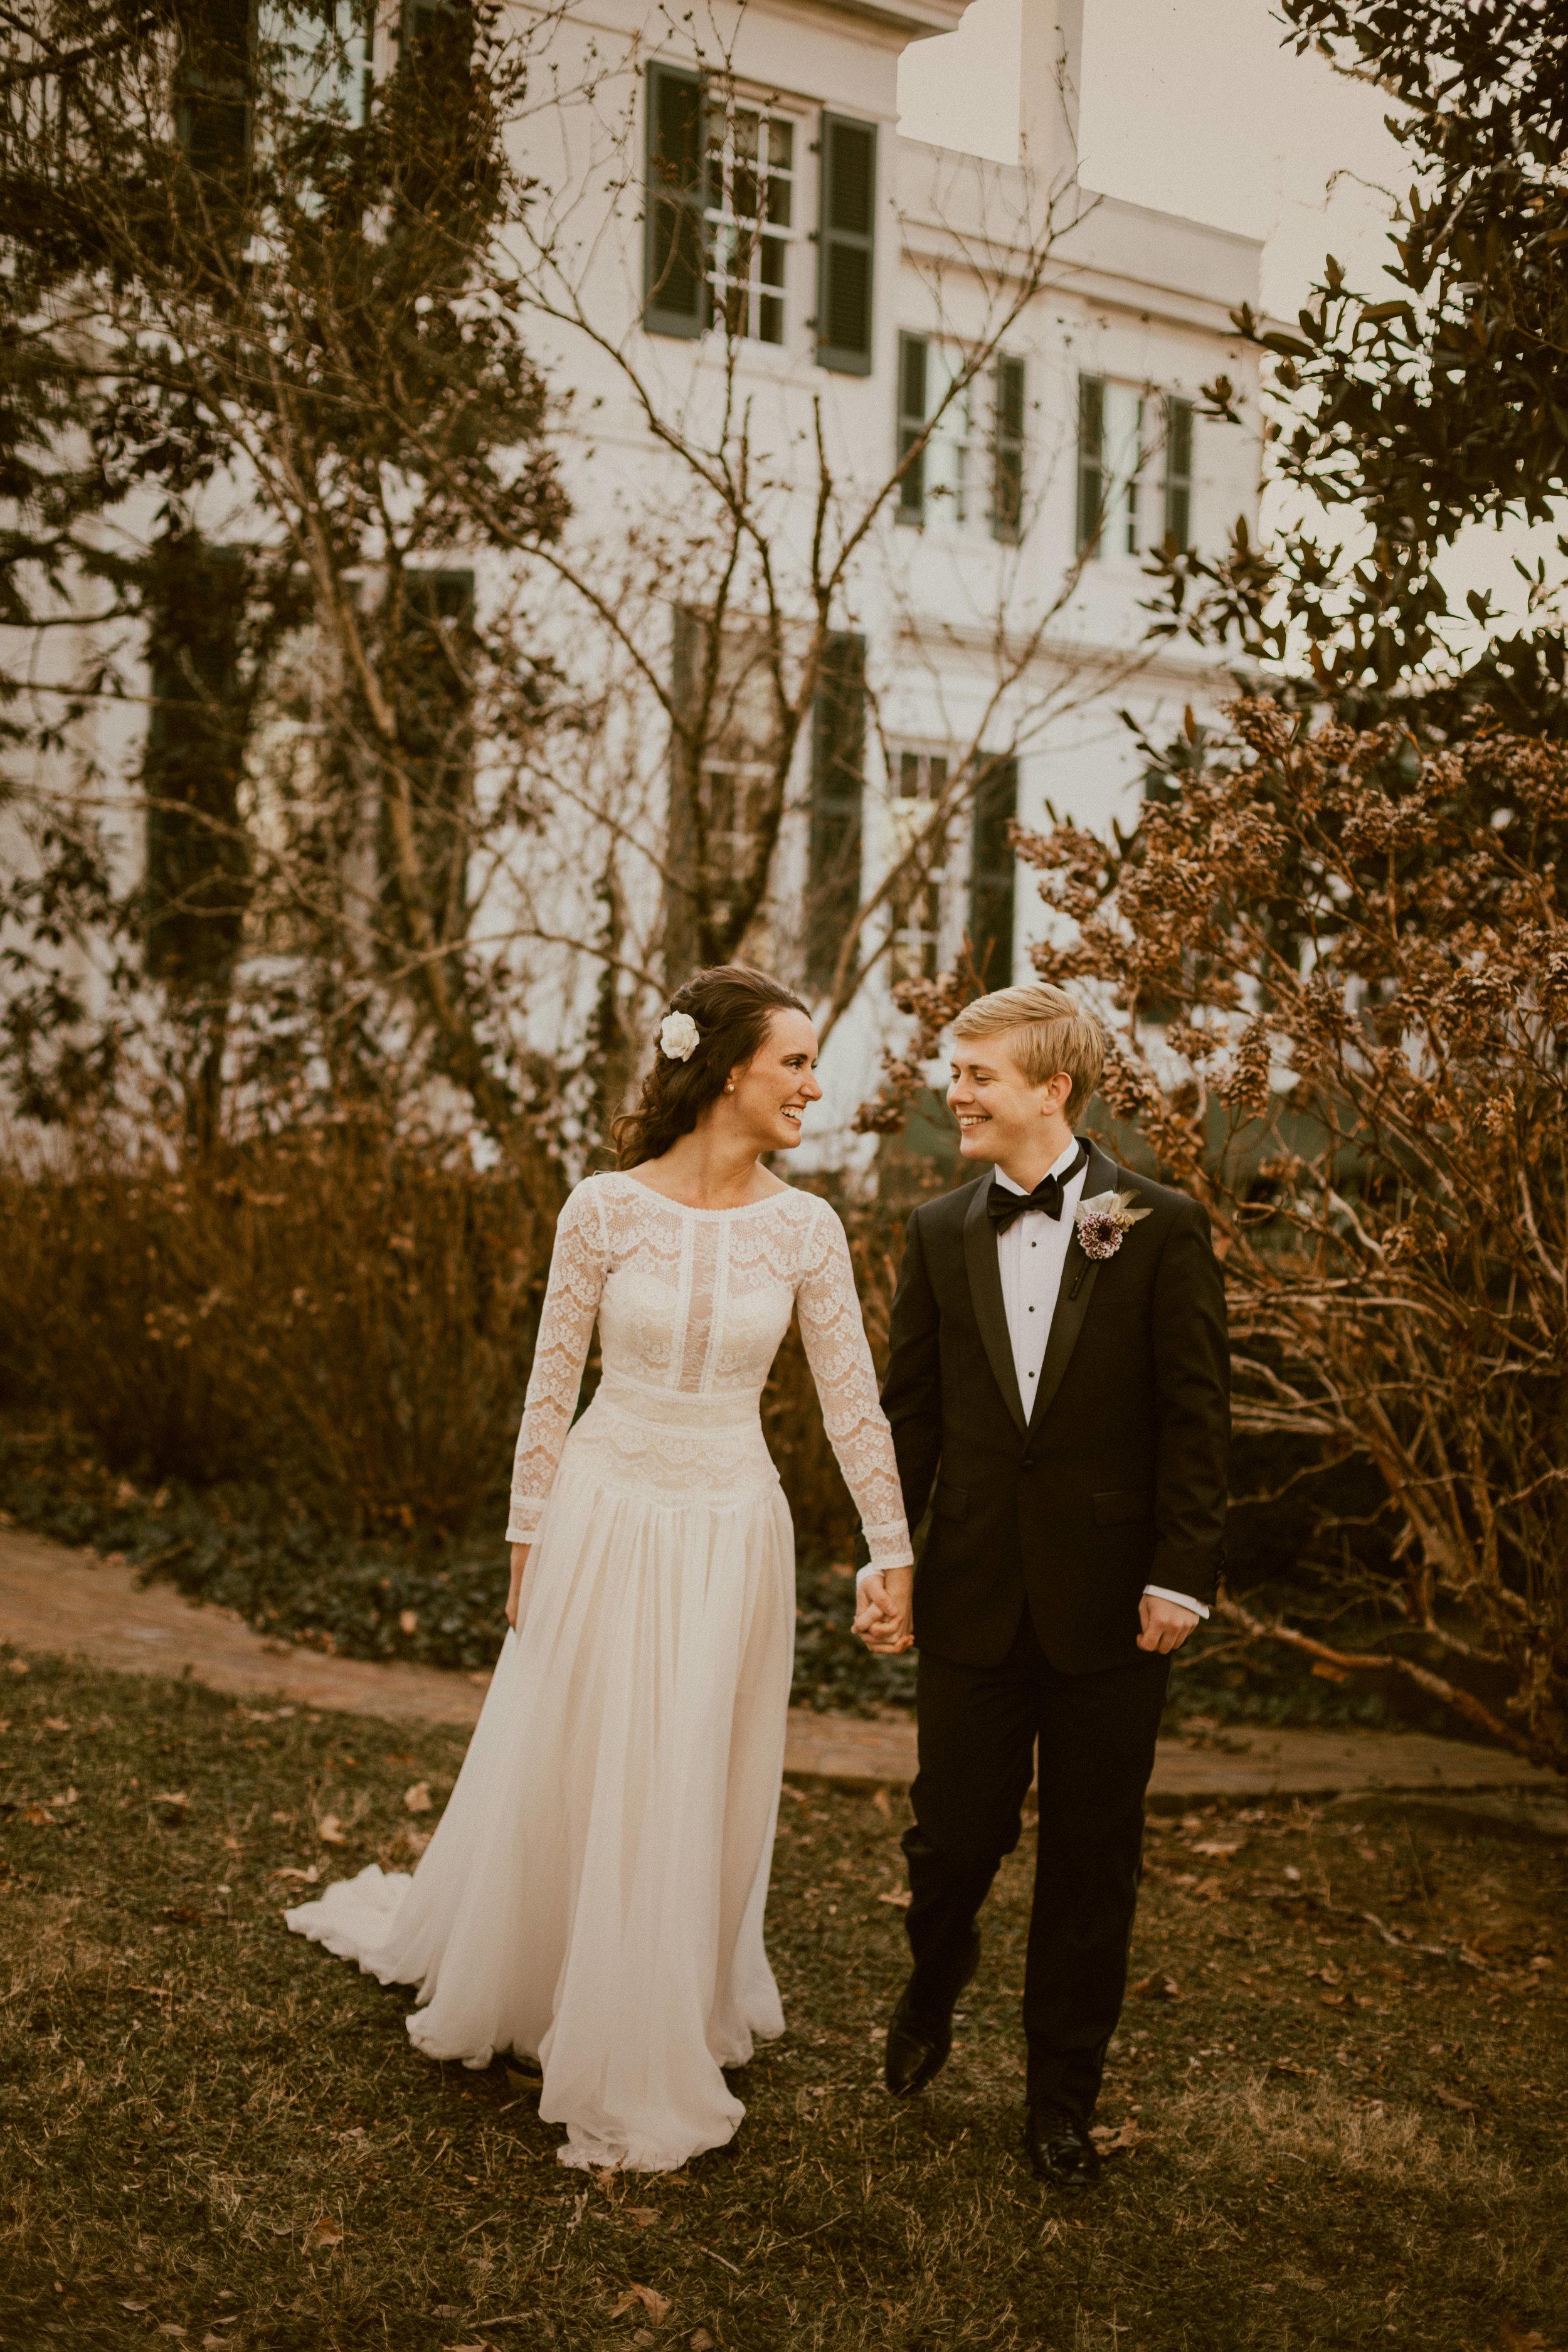 Nashville Wedding Photography by Saul Cervantes Photography-113.jpg